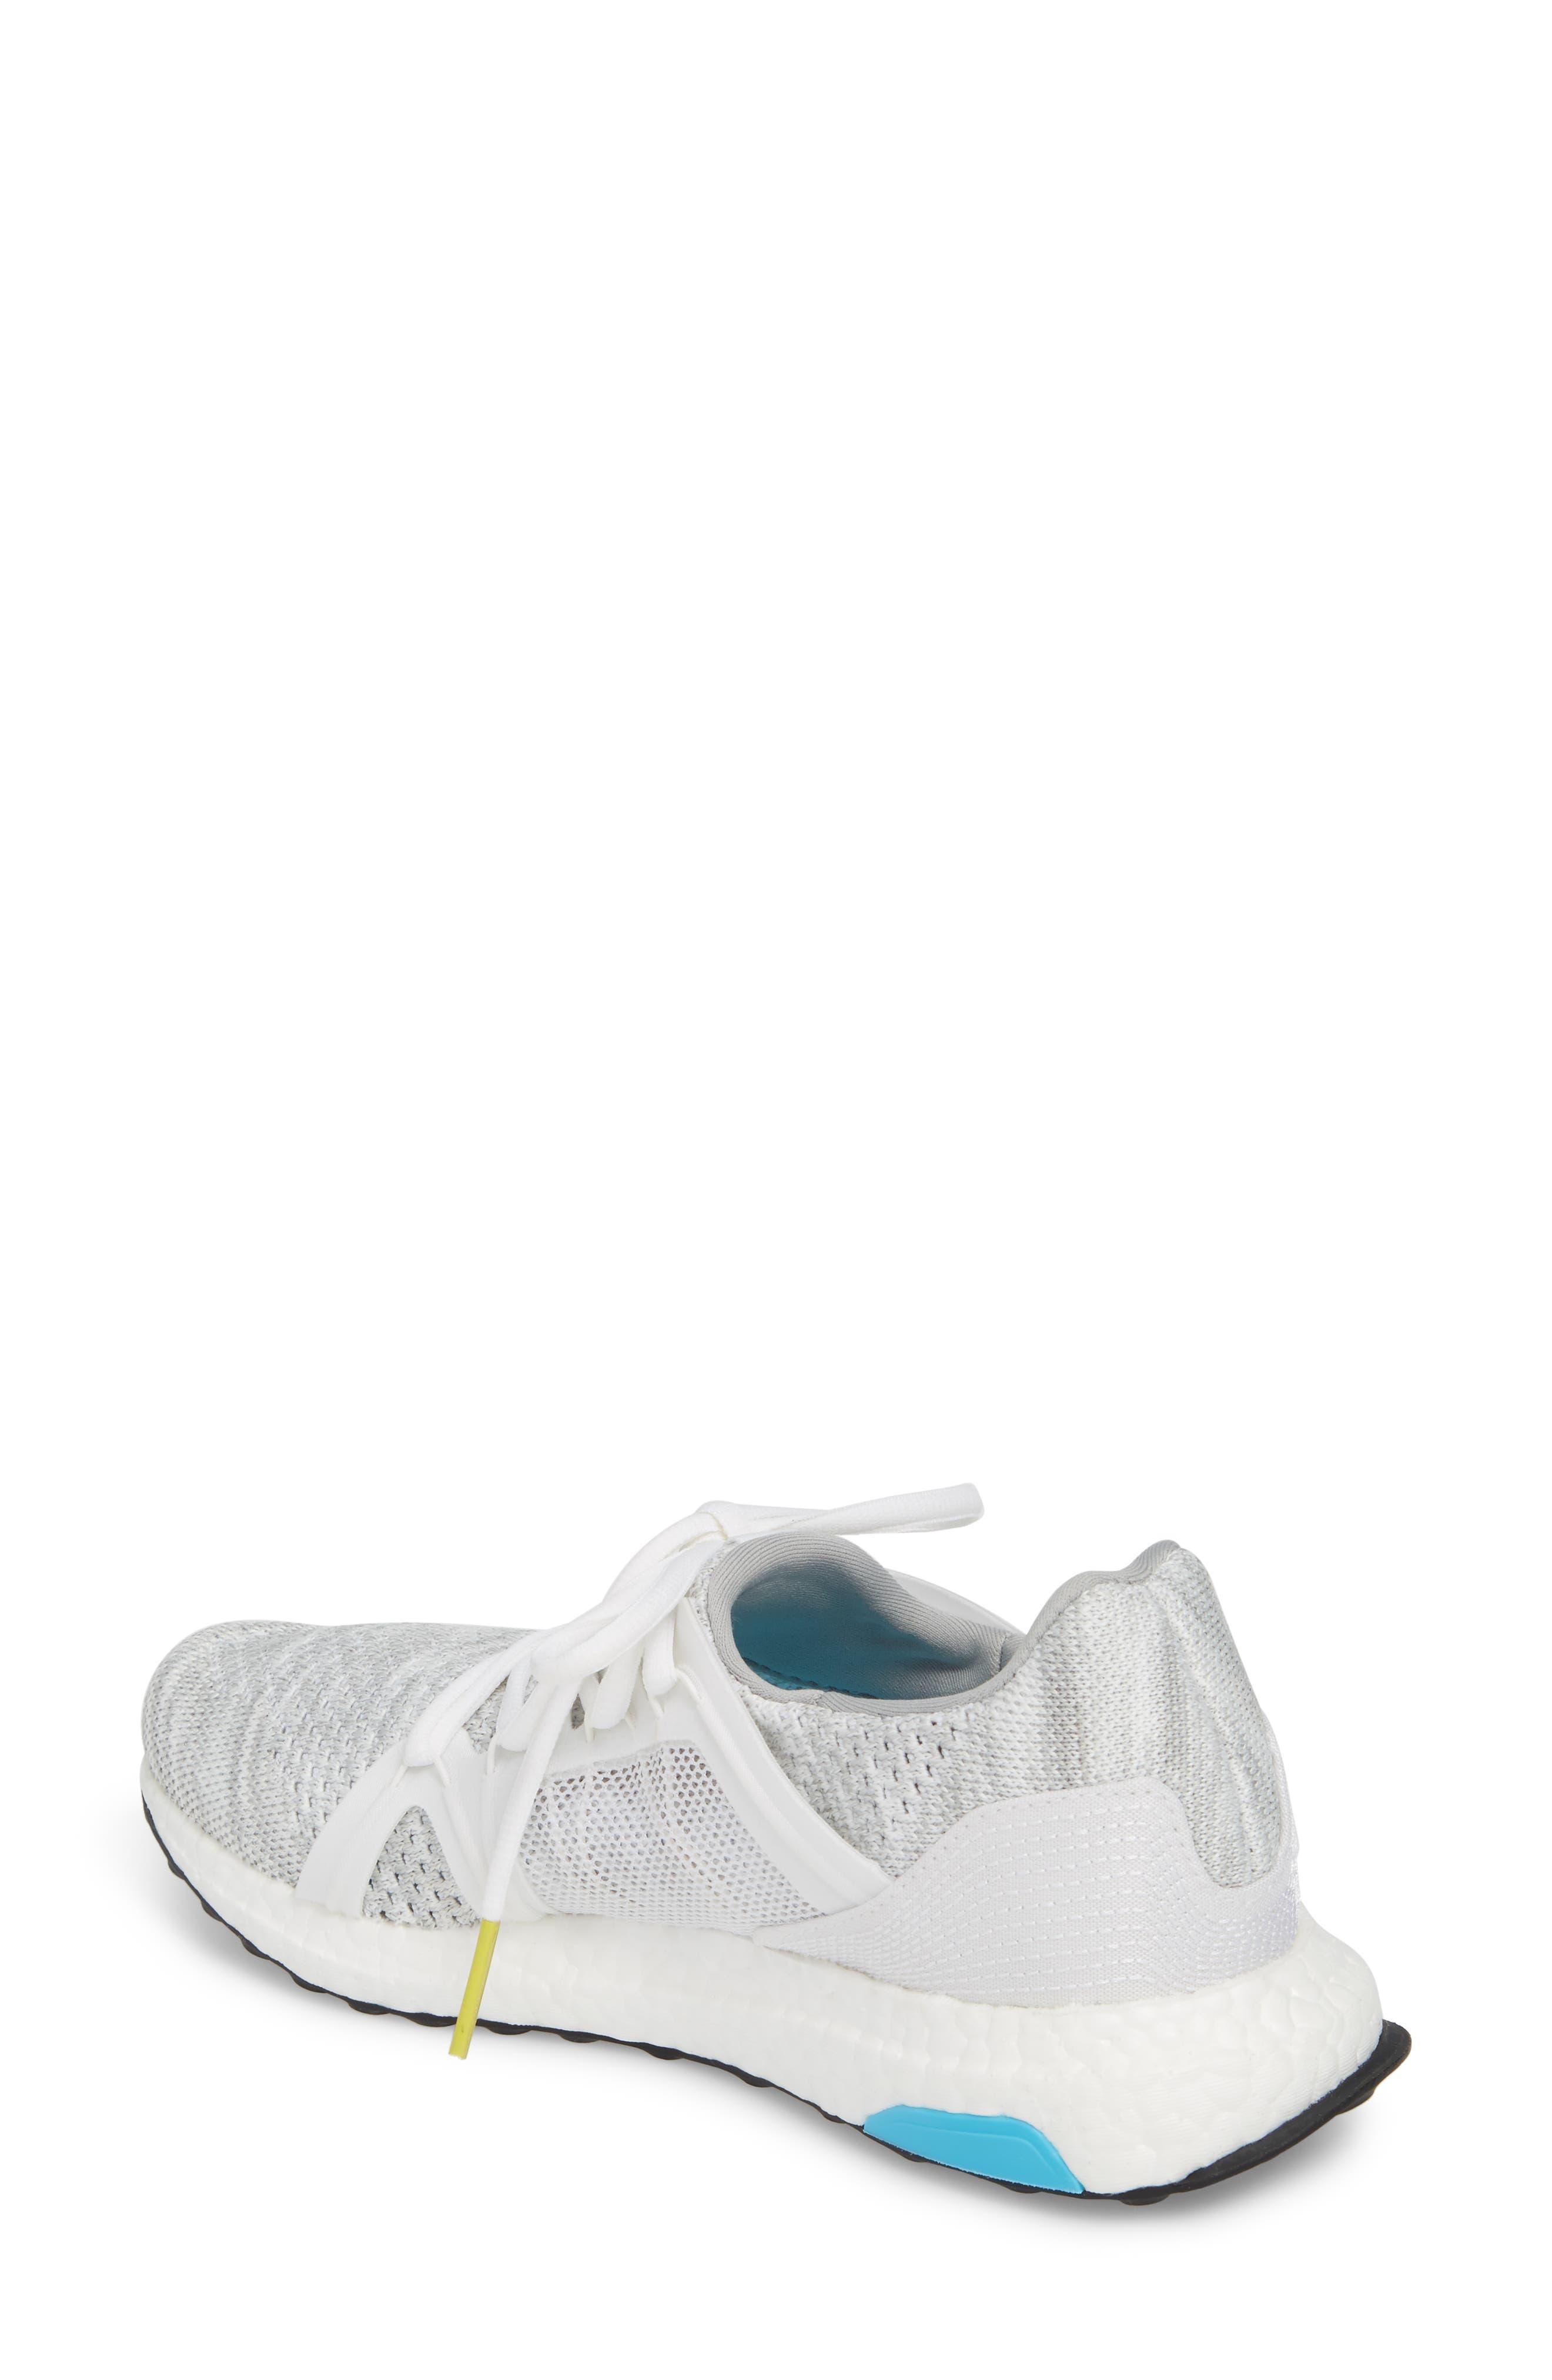 Alternate Image 2  - adidas by Stella McCartney Ultraboost x Parley Running Shoe (Women)